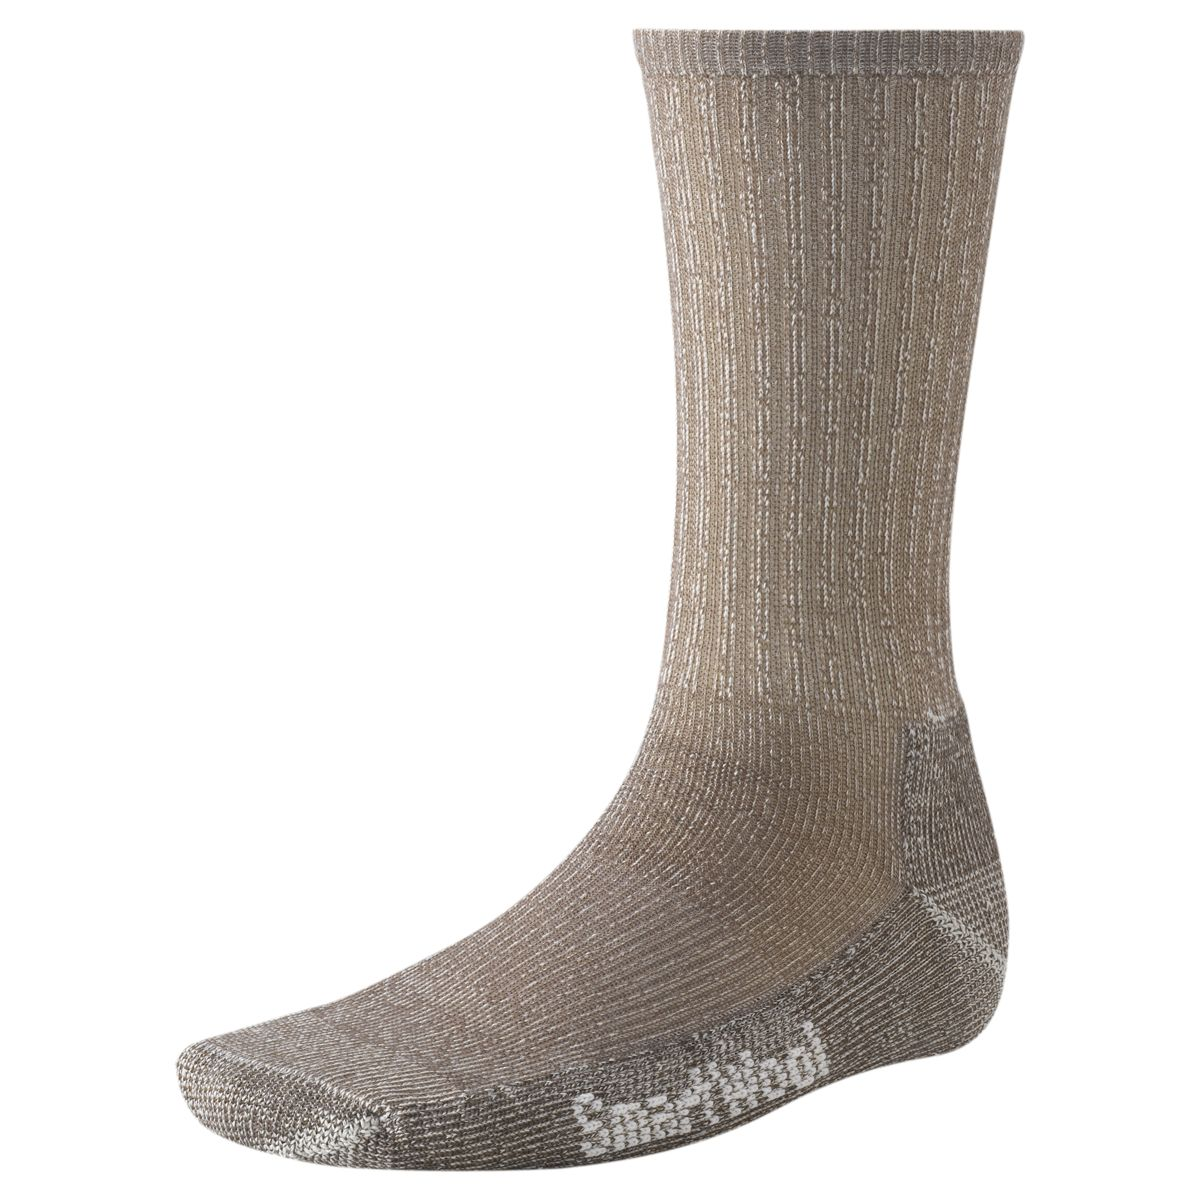 Smartwool Light Hiking Socks - Brown, M